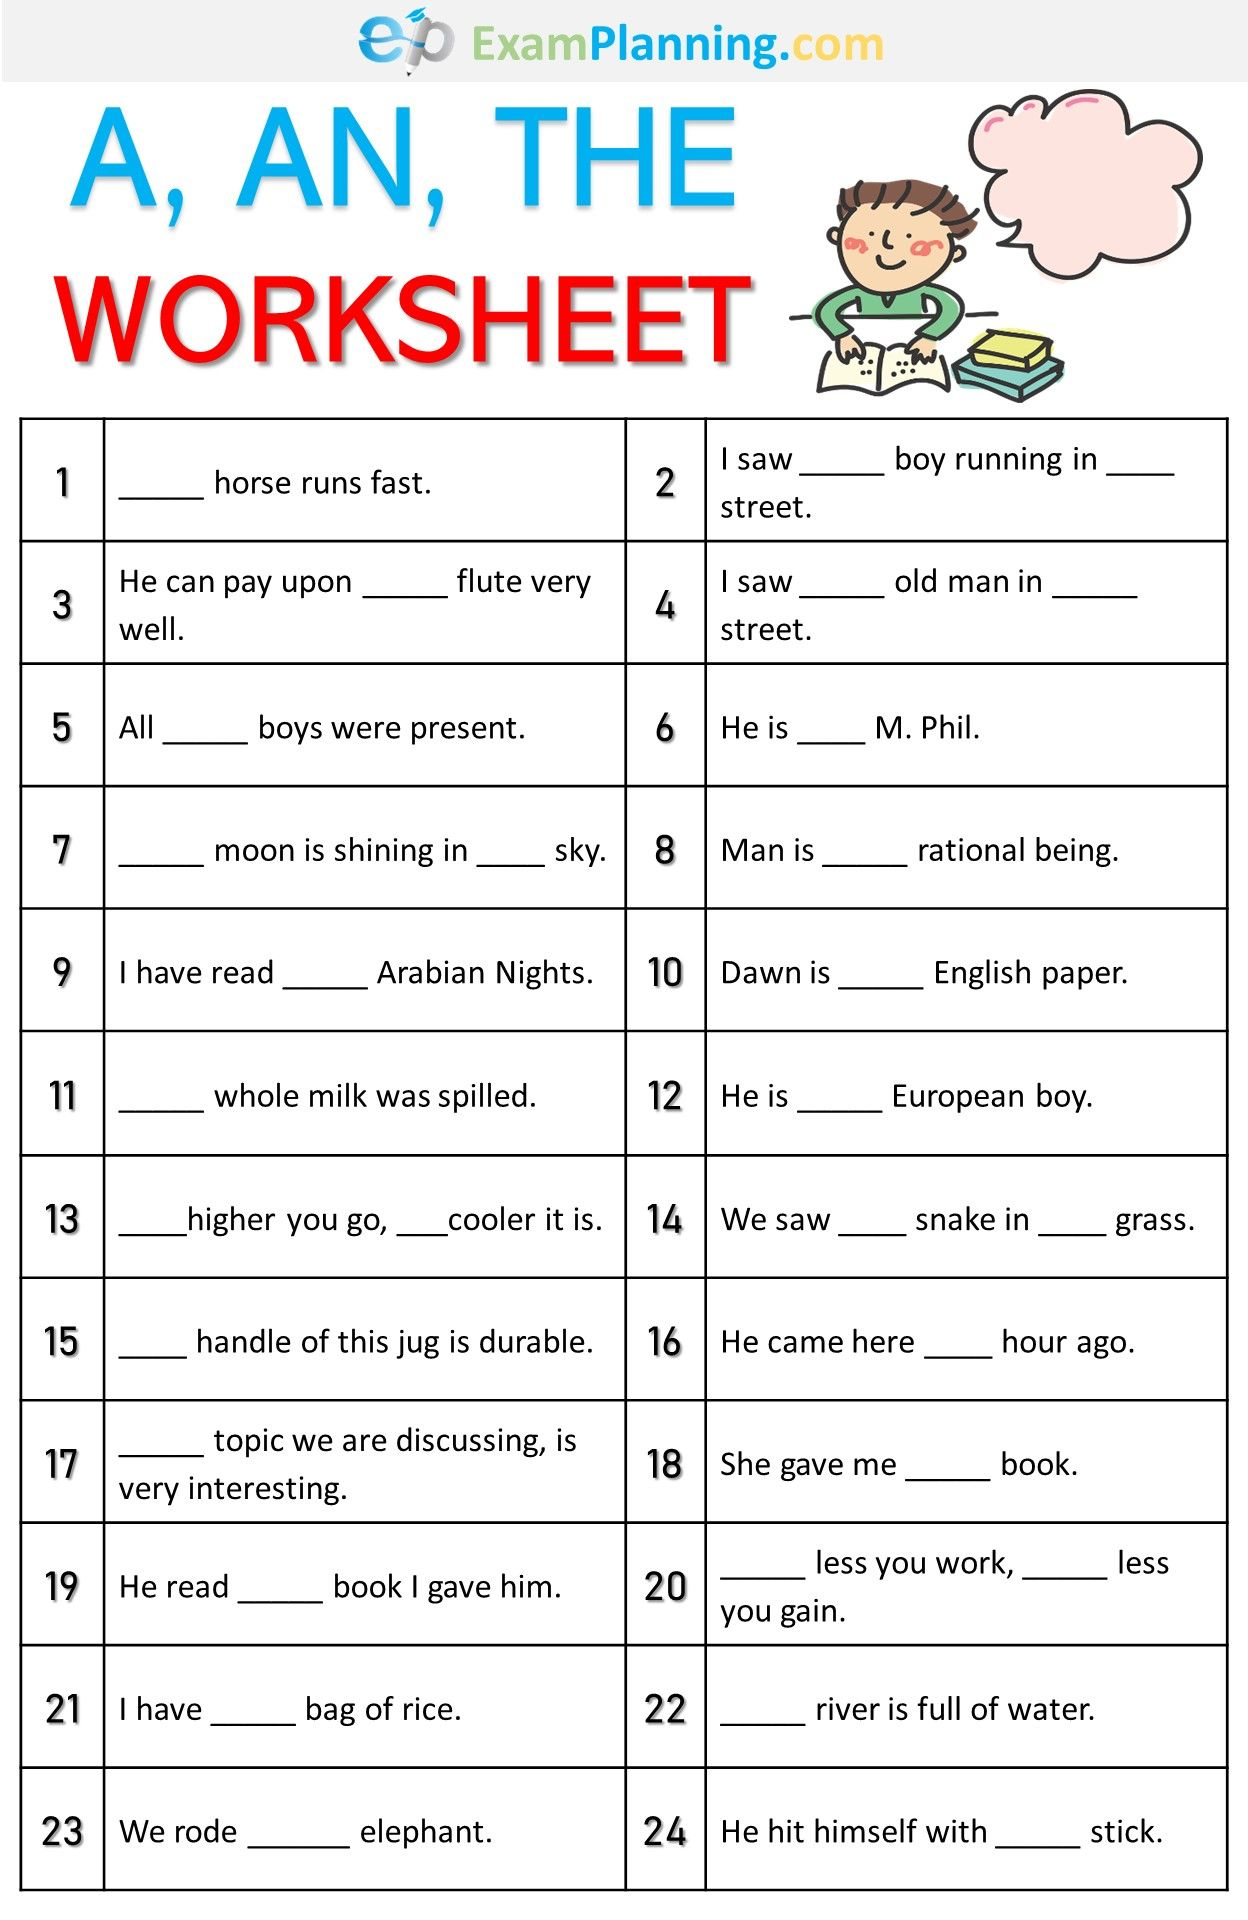 A An The Worksheet English Grammar For Kids English Lessons For Kids English Grammar Exercises